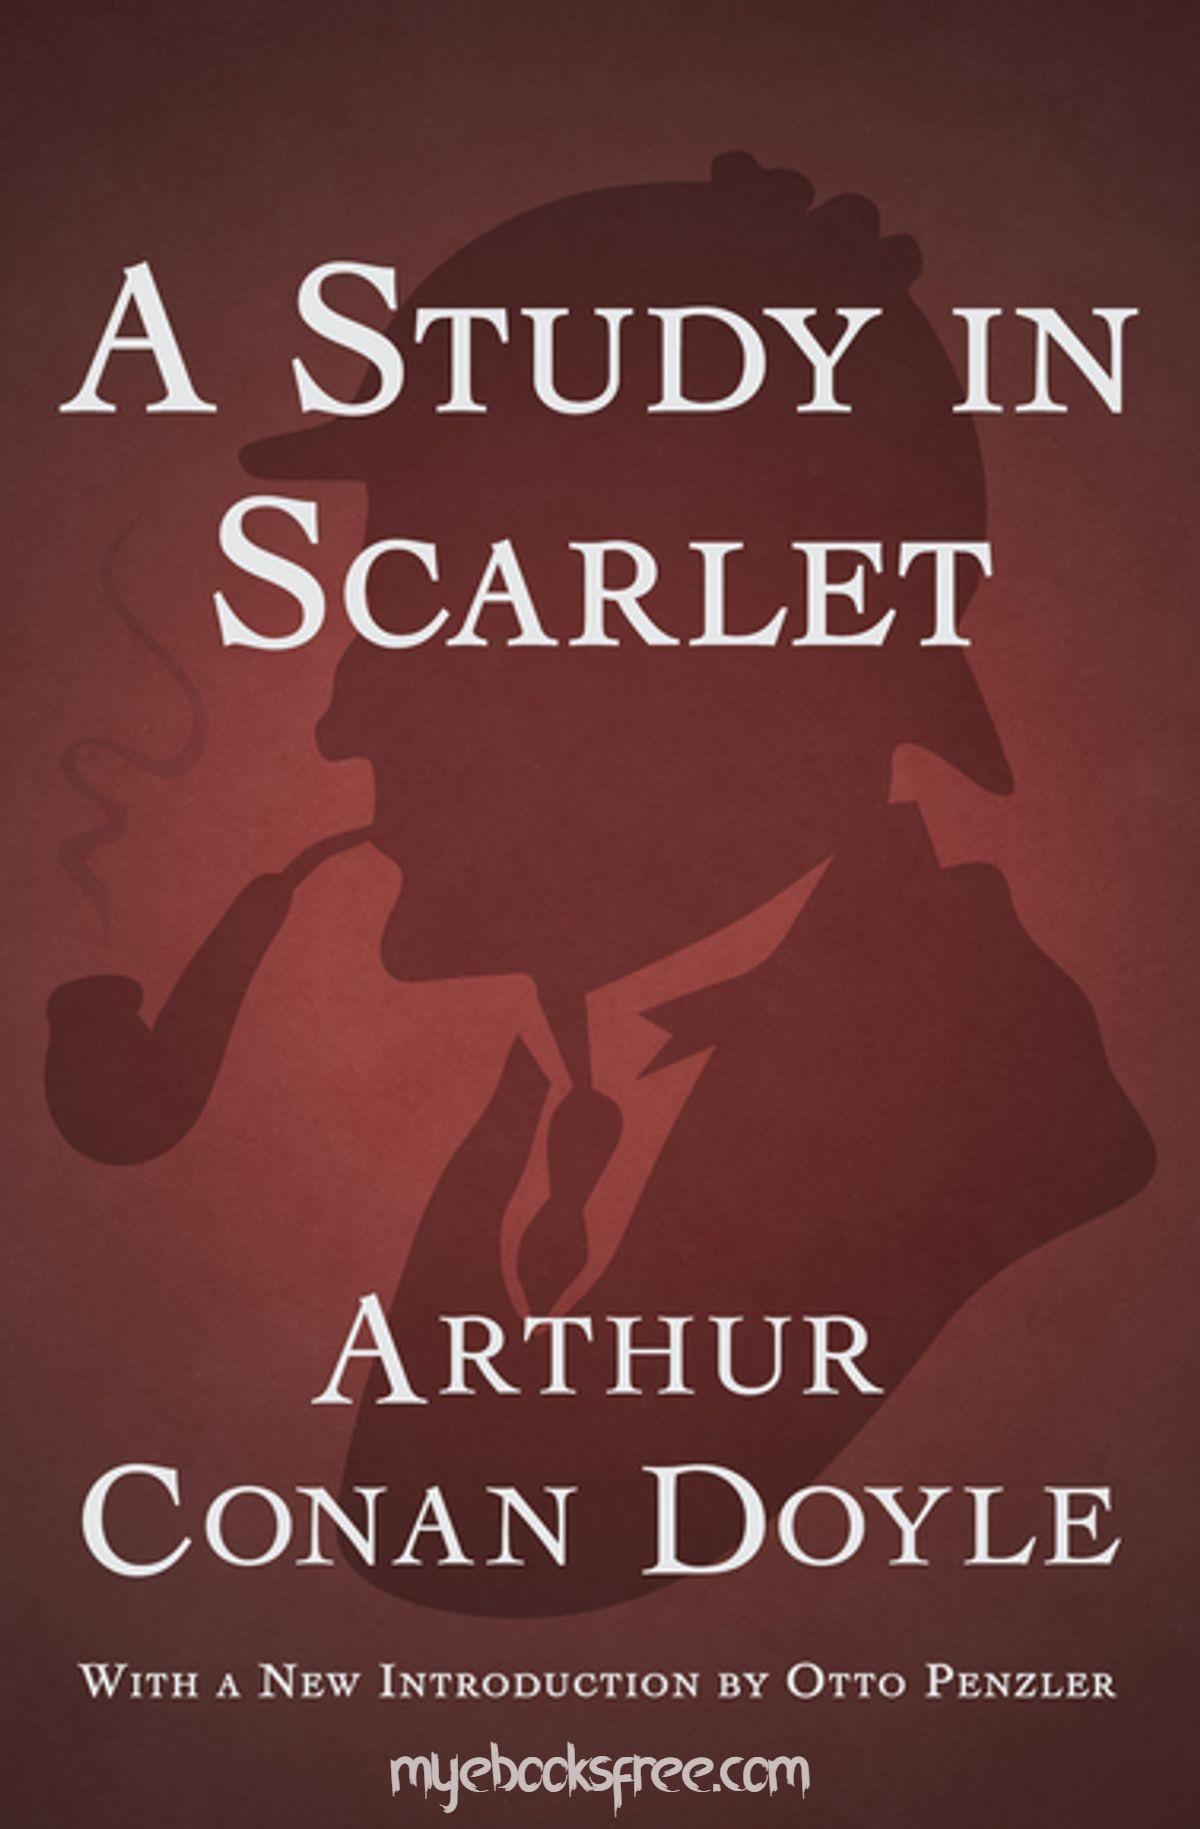 A Study in Scarlet (Sherlock Holmes, #1) By Arthur Conan Doyle Pdf Book Download